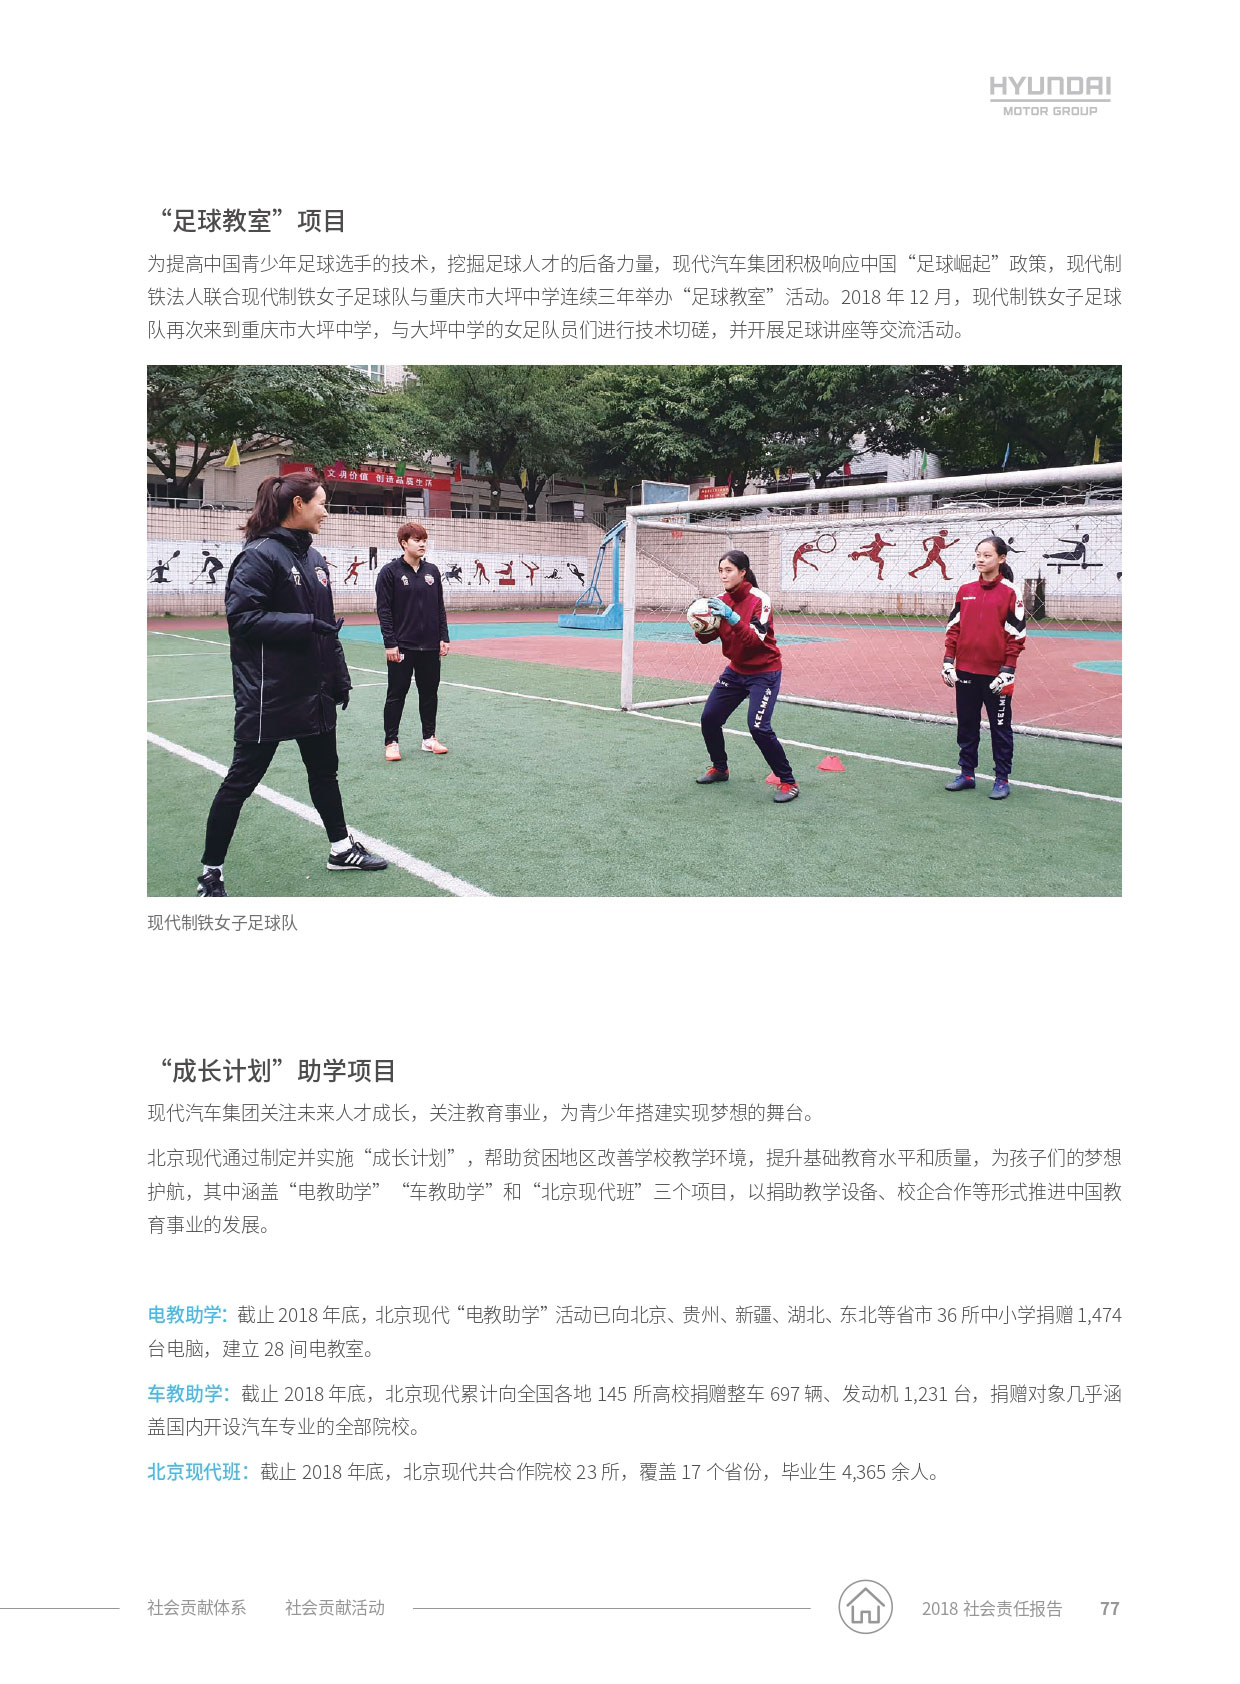 hyundai_china_csr_2018_page-0040_02